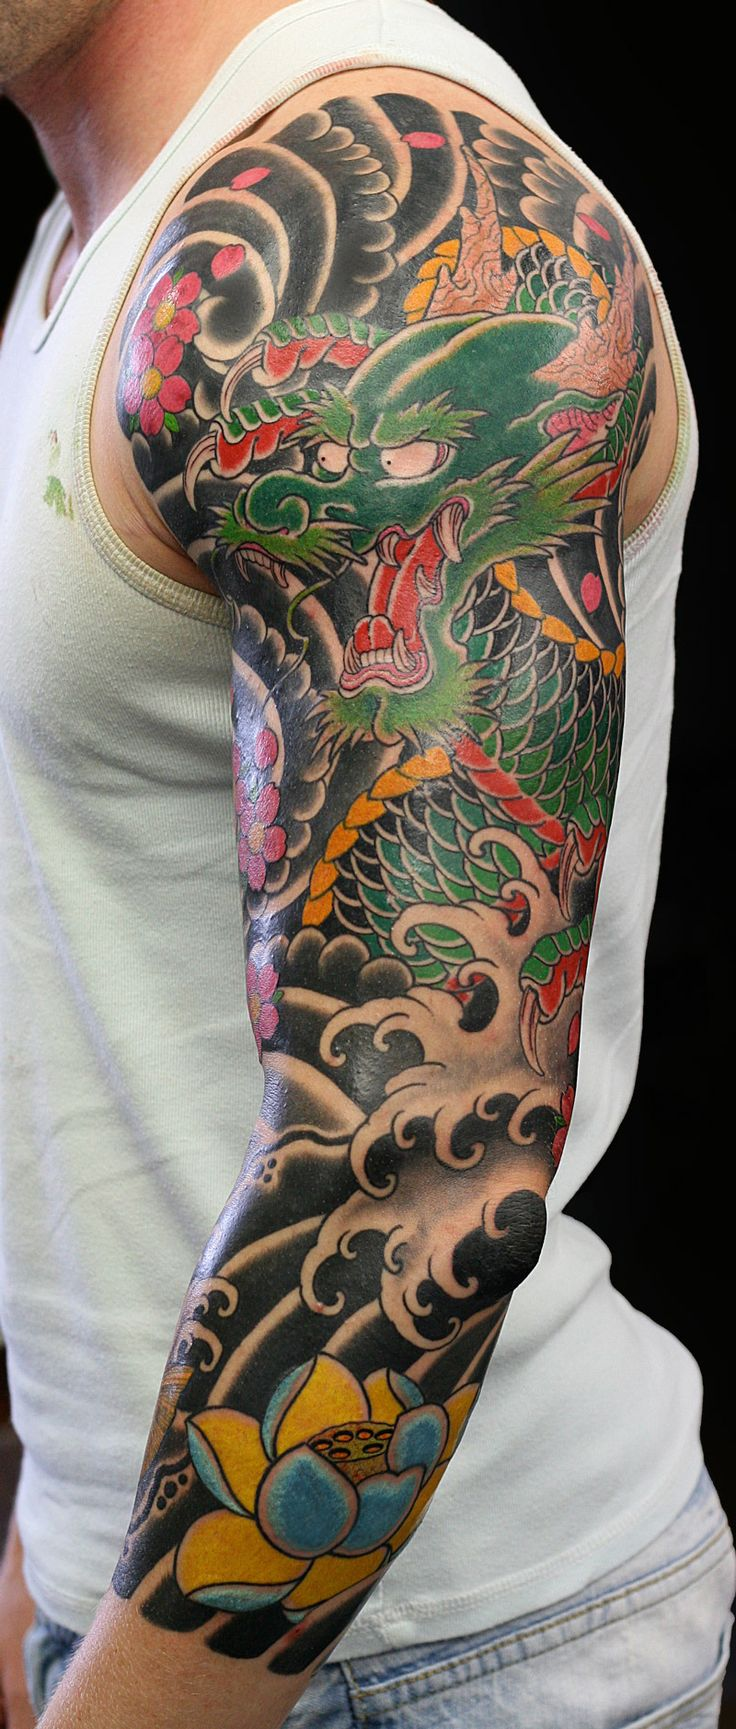 dragon-tattoos-japanese-tattoos-rhys-gordon-sydney-tattoo-studios.jpg